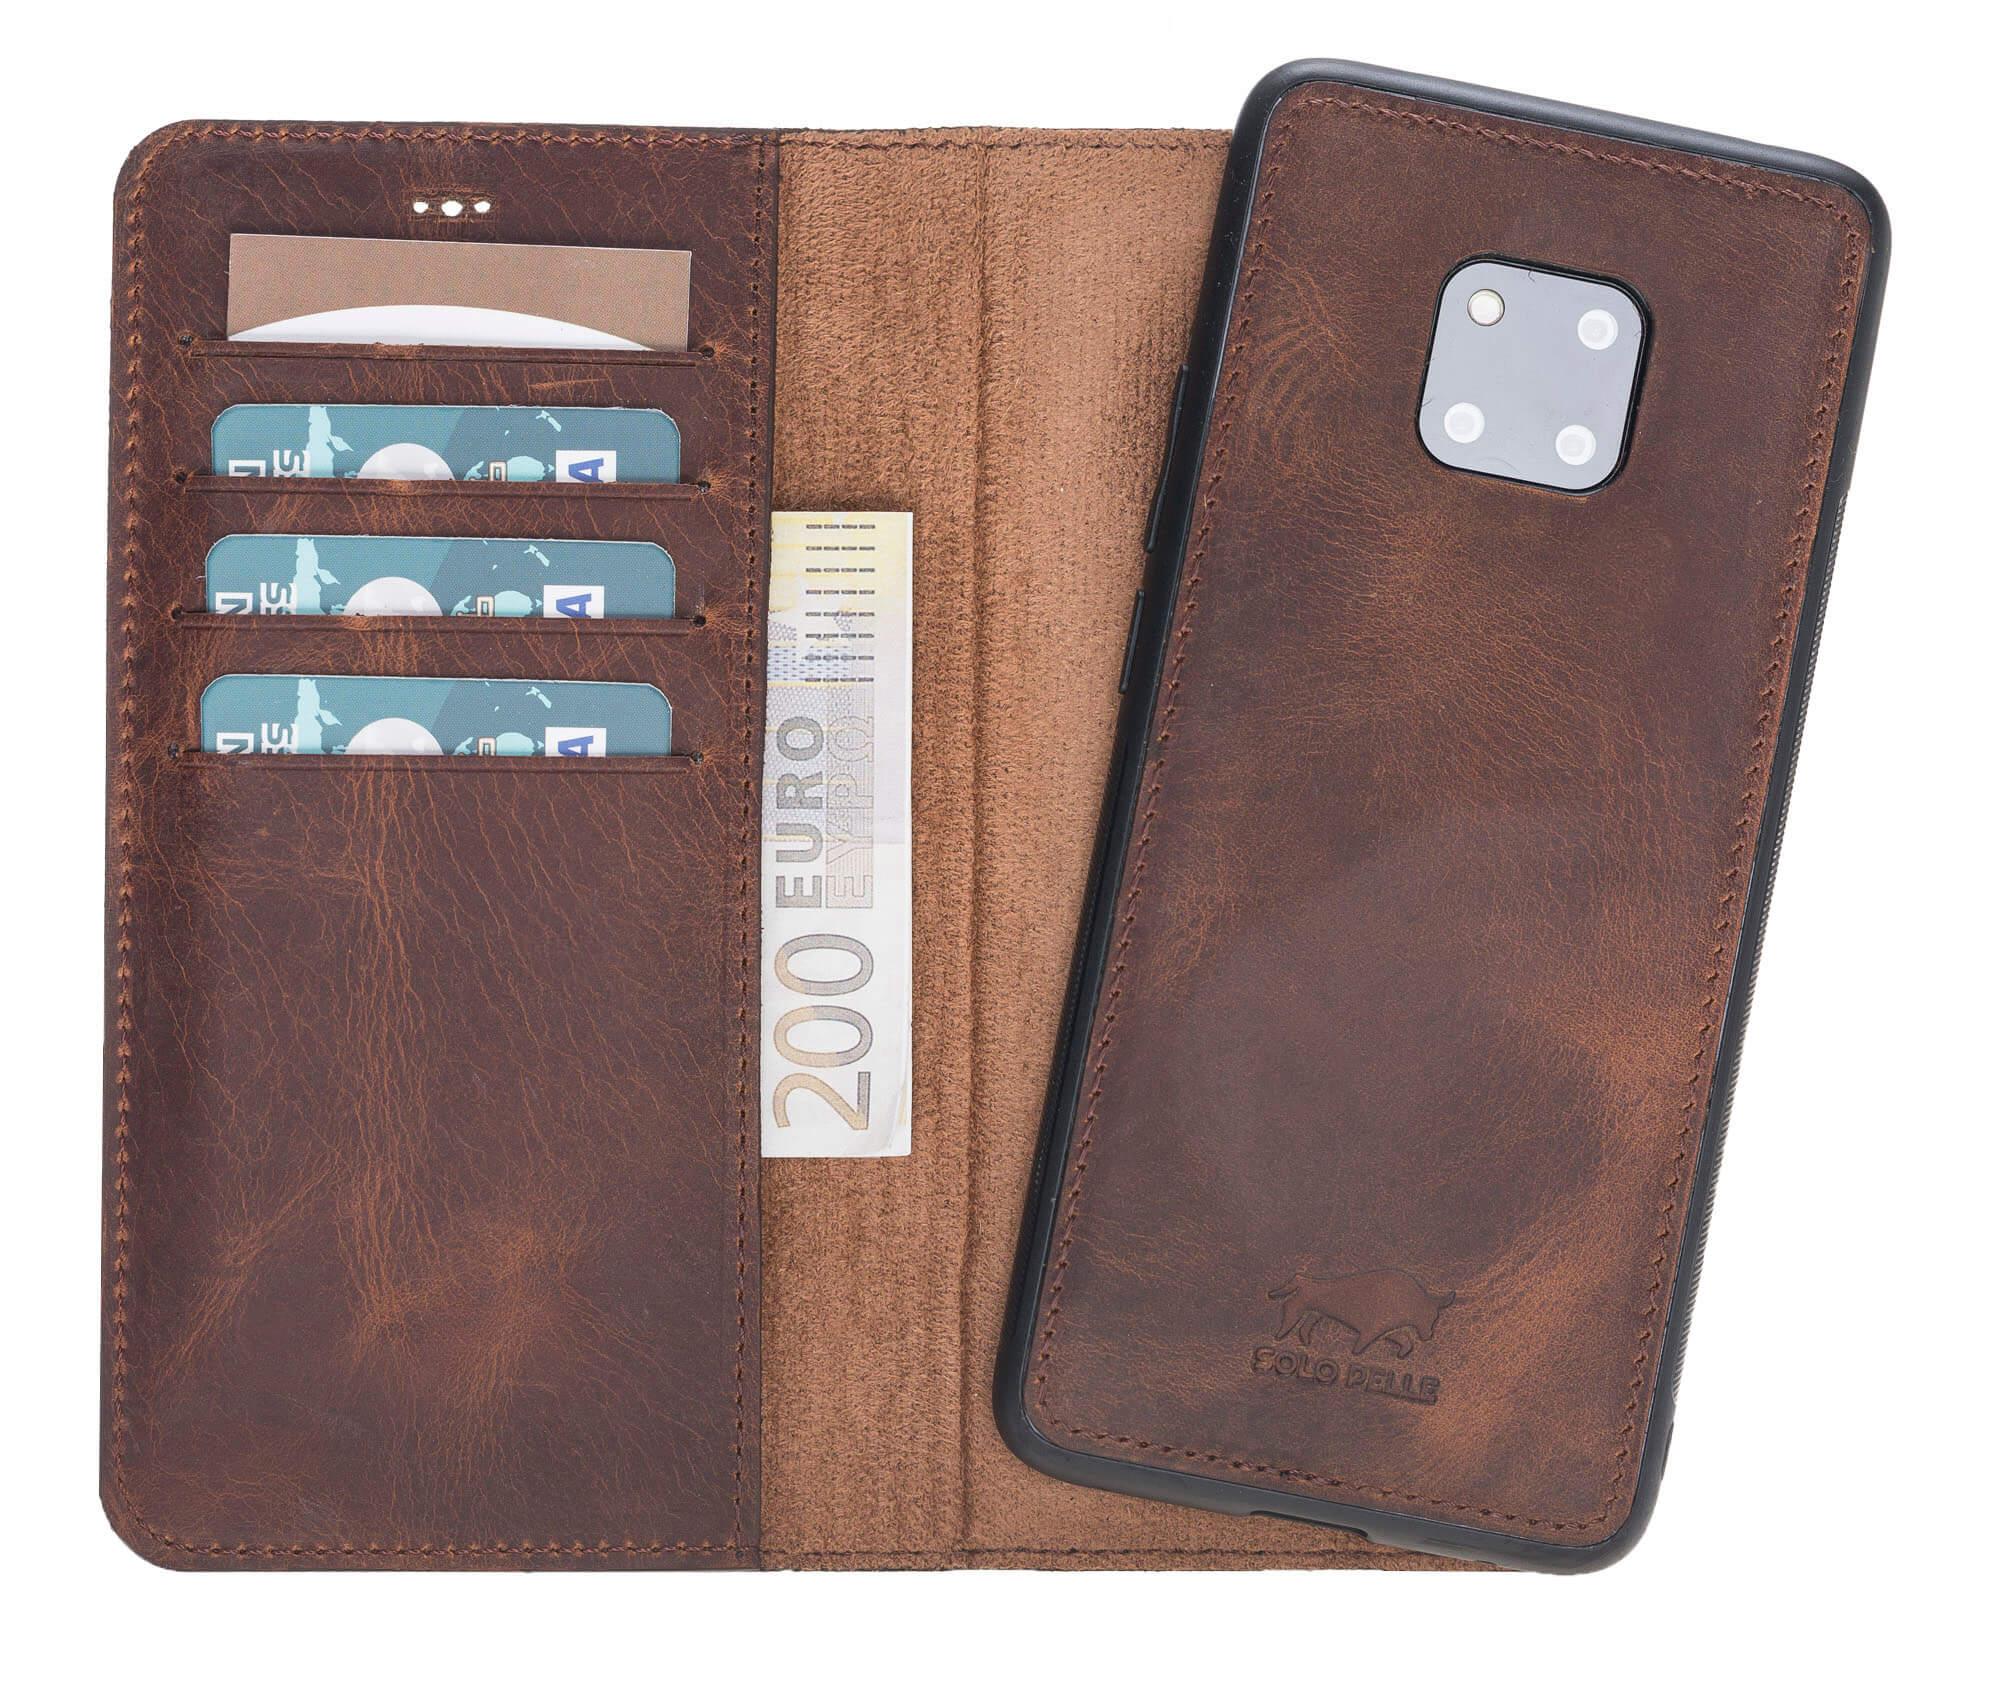 Lederhülle abnehmbar (2in1) für das Huawei Mate 20 Pro in Vintage Braun Leder Hülle Tasche Lederhülle Ledertasche